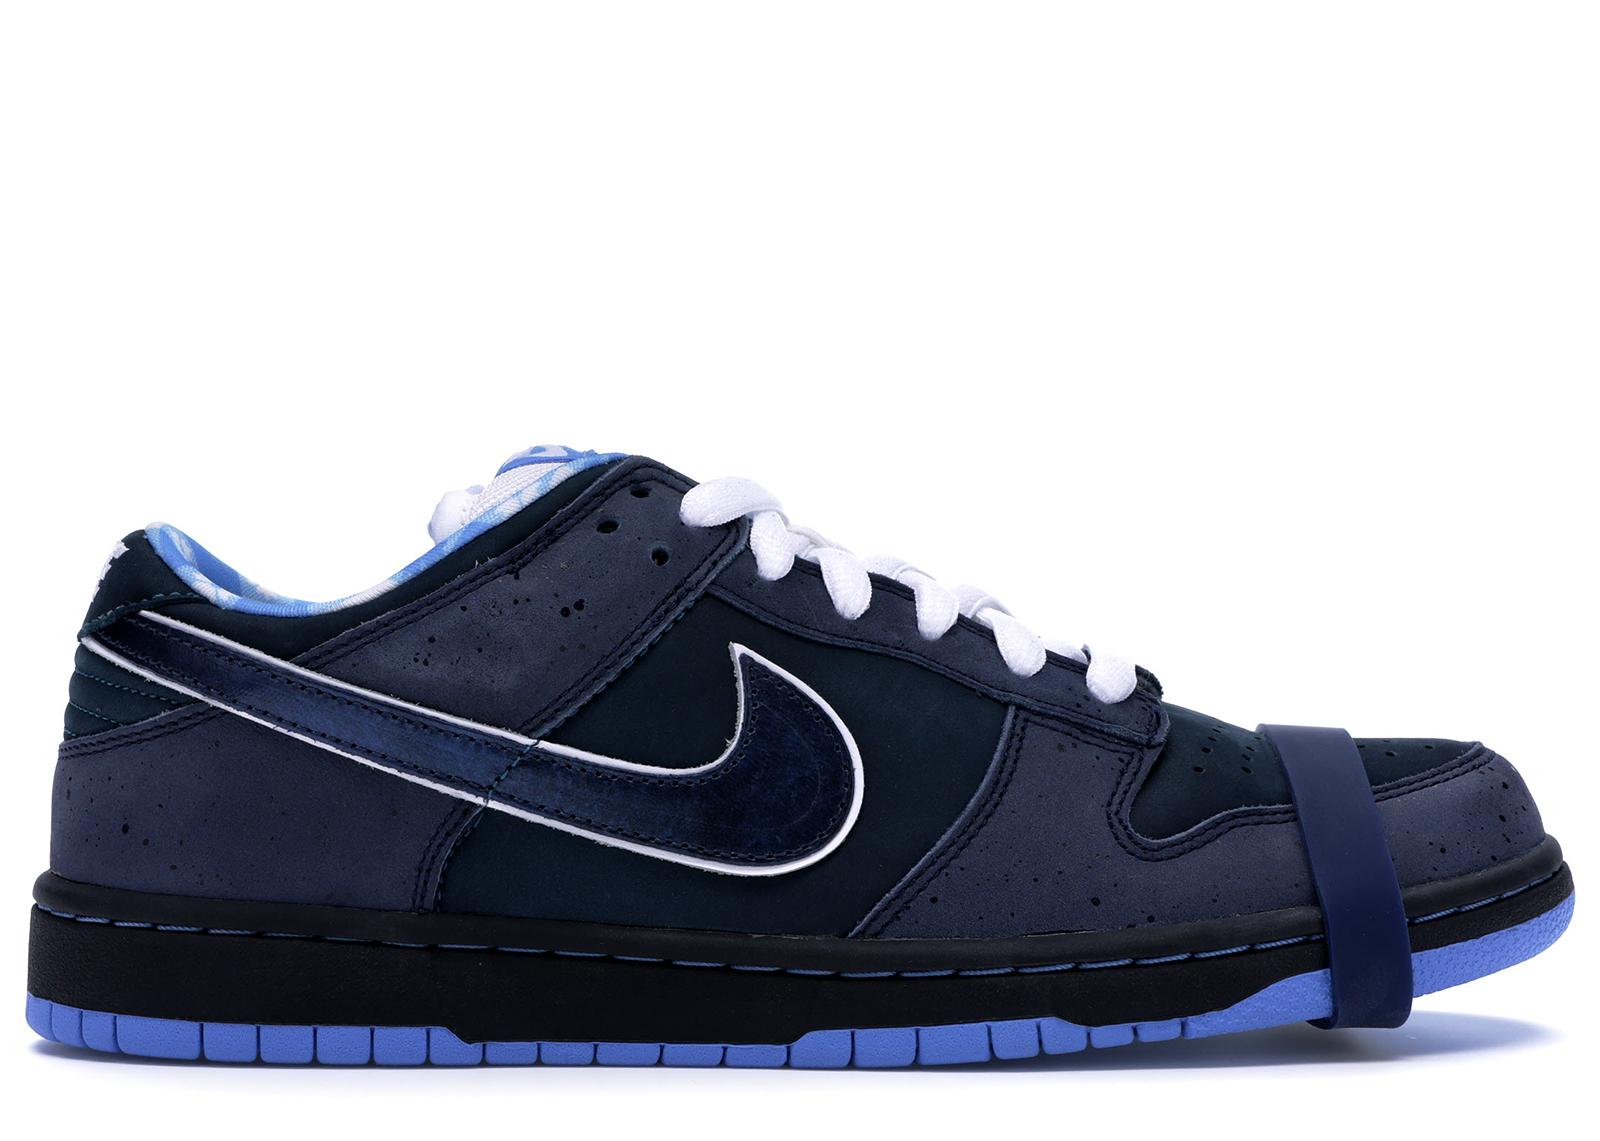 Nike Dunk SB Low Blue Lobster - 313170-342